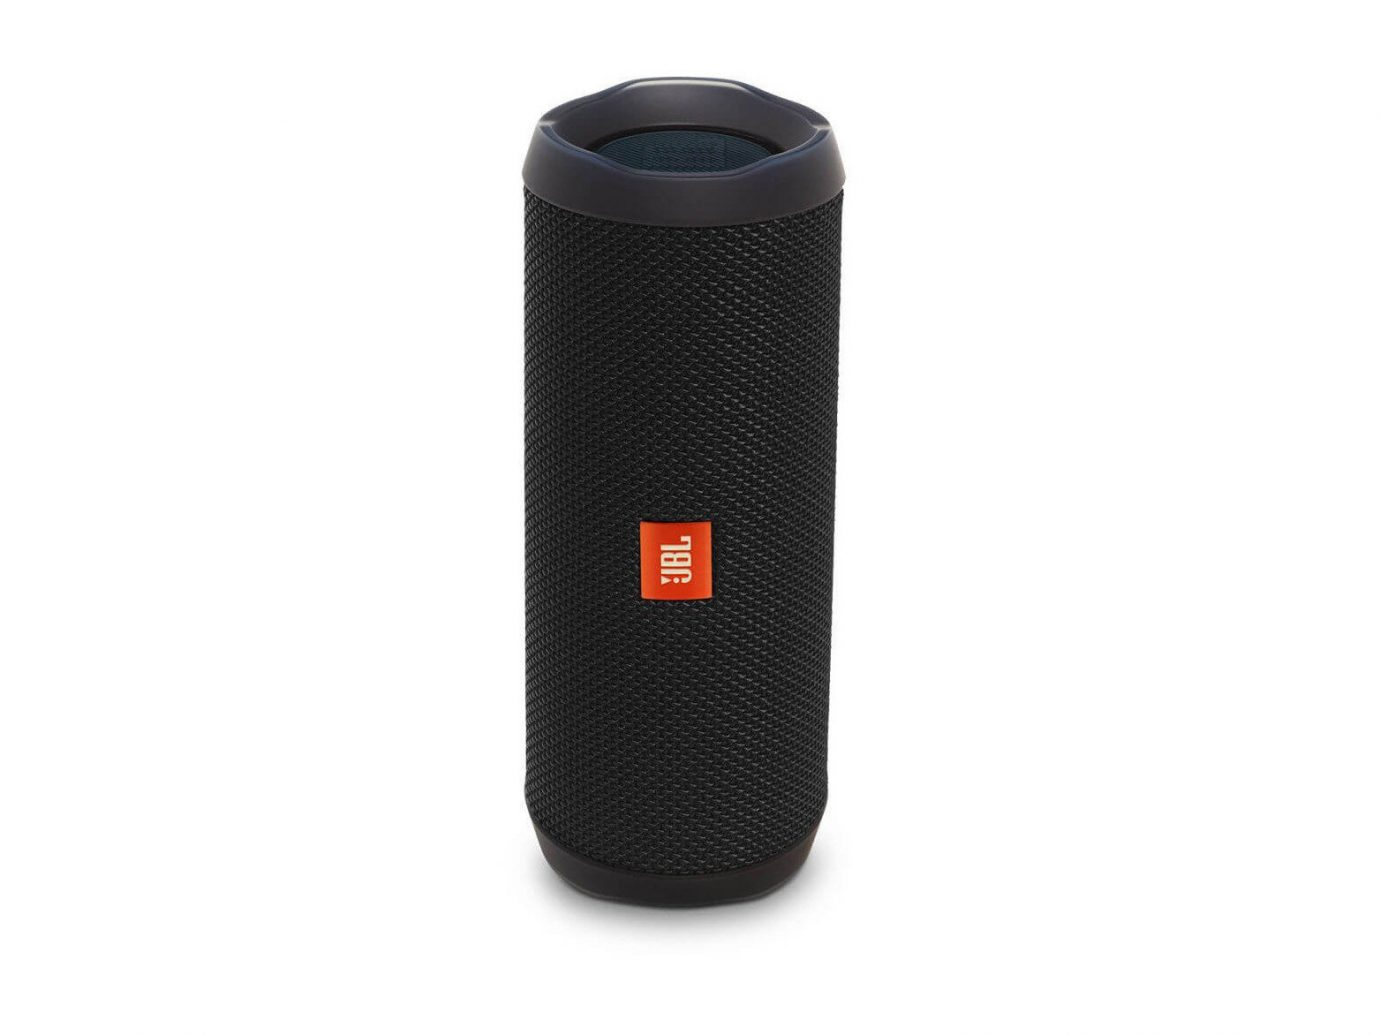 Style + Design product product design microphone hardware electronics multimedia electronic device audio